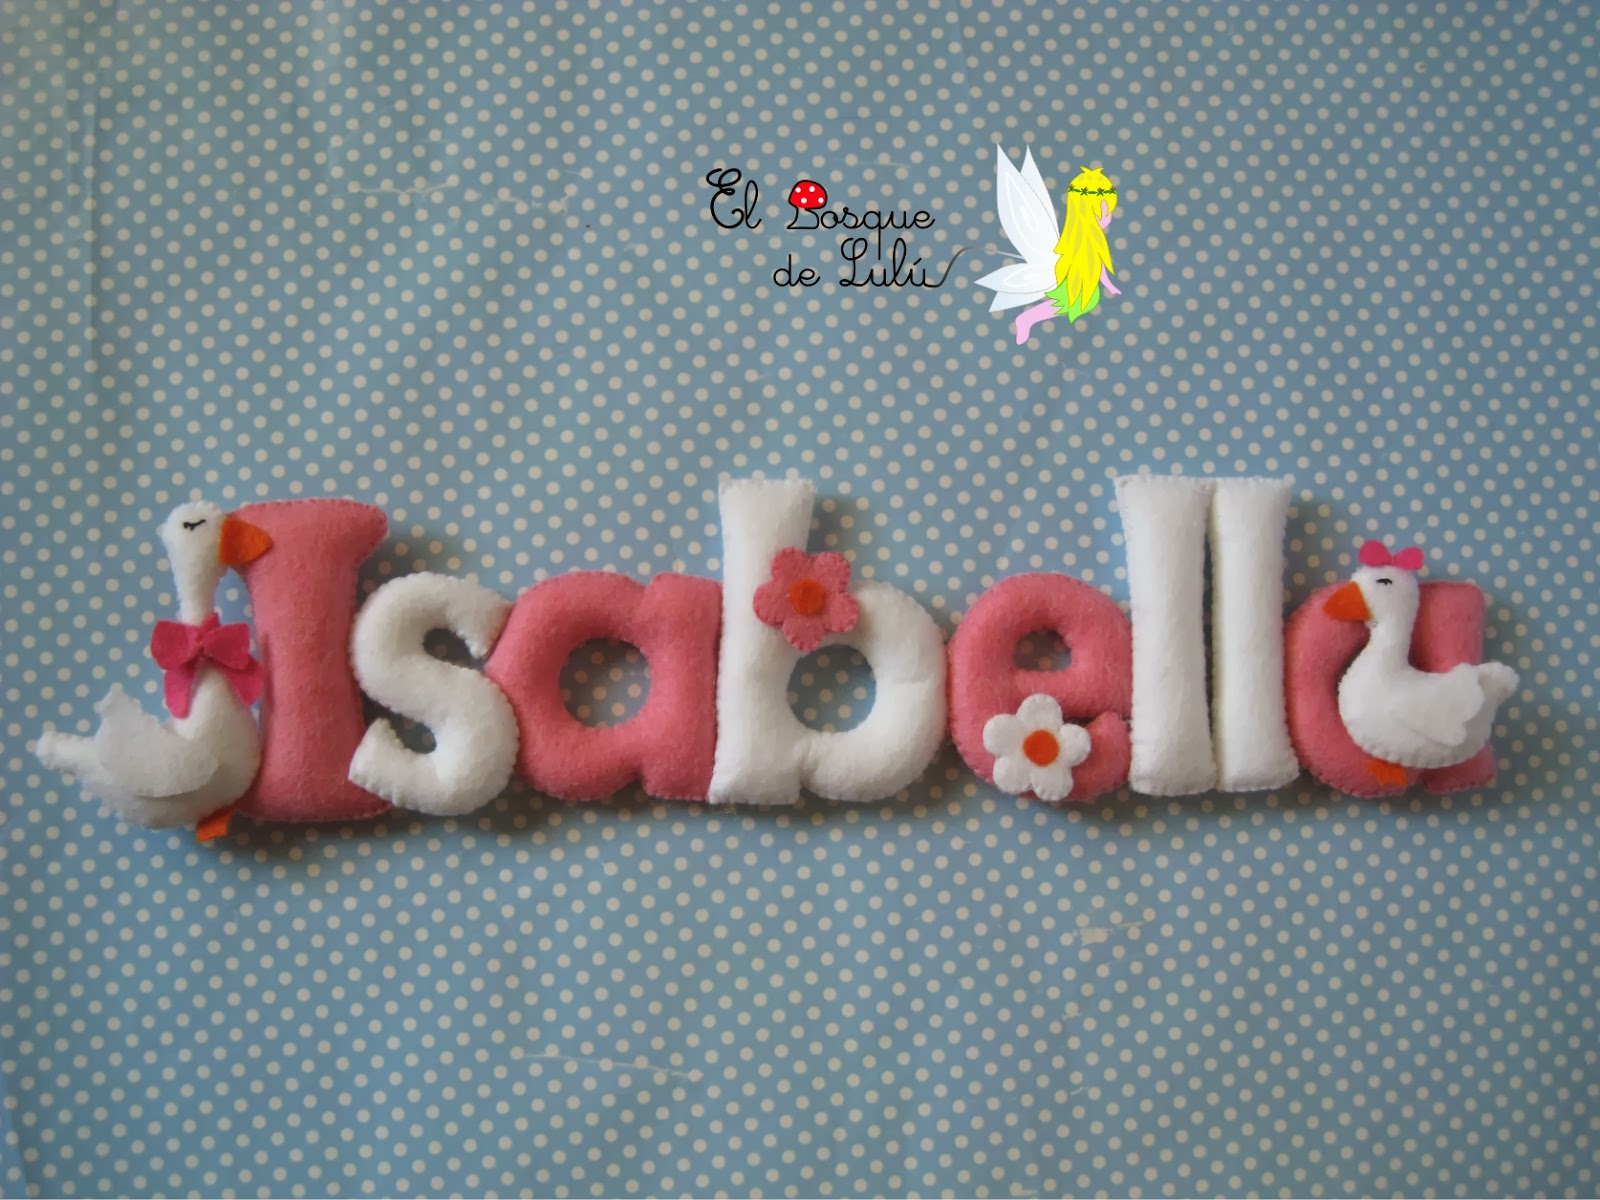 nombre-decorativo-en-fieltro-Isabella-name-banner